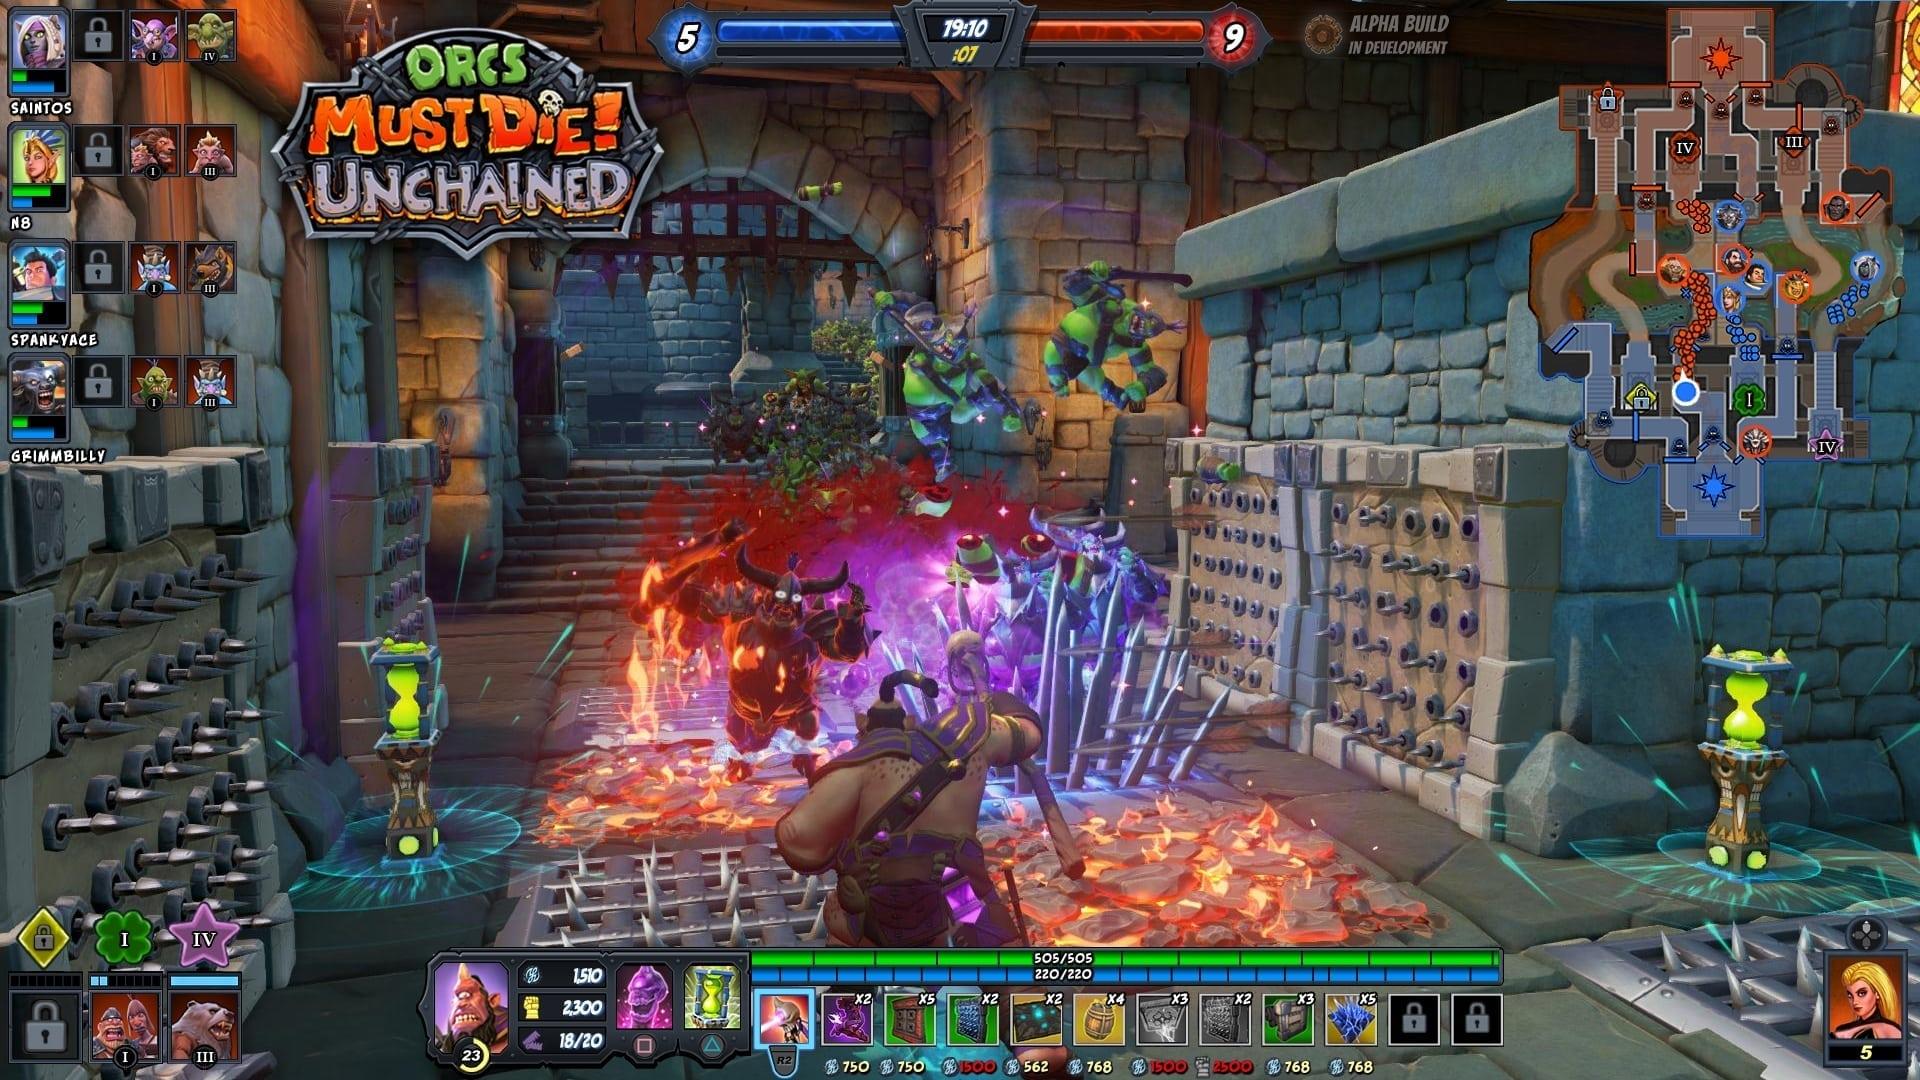 Orcs Must Die Unchained screenshot 1